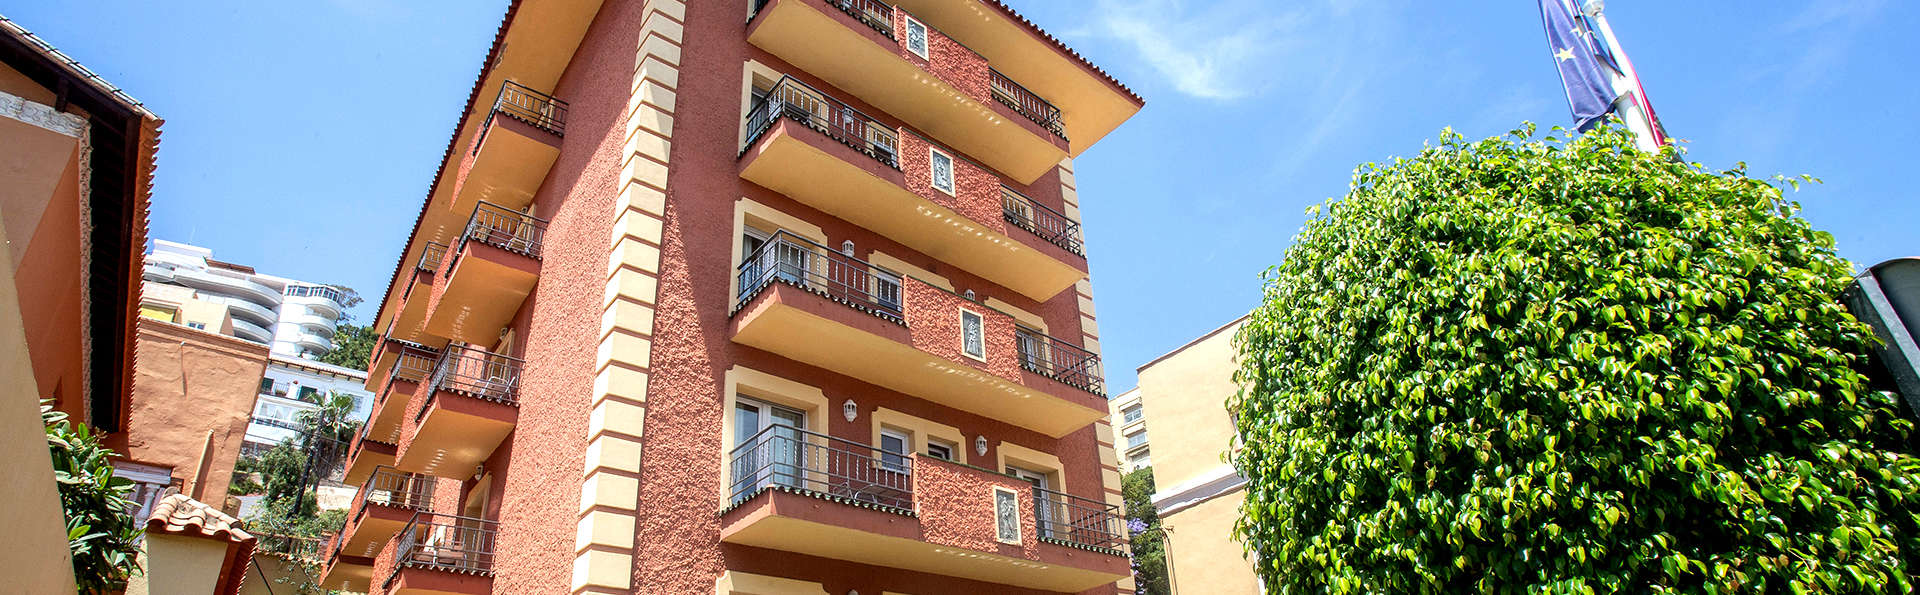 Hotel Soho Los Naranjos - EDIT_NEW_FRONT2.jpg